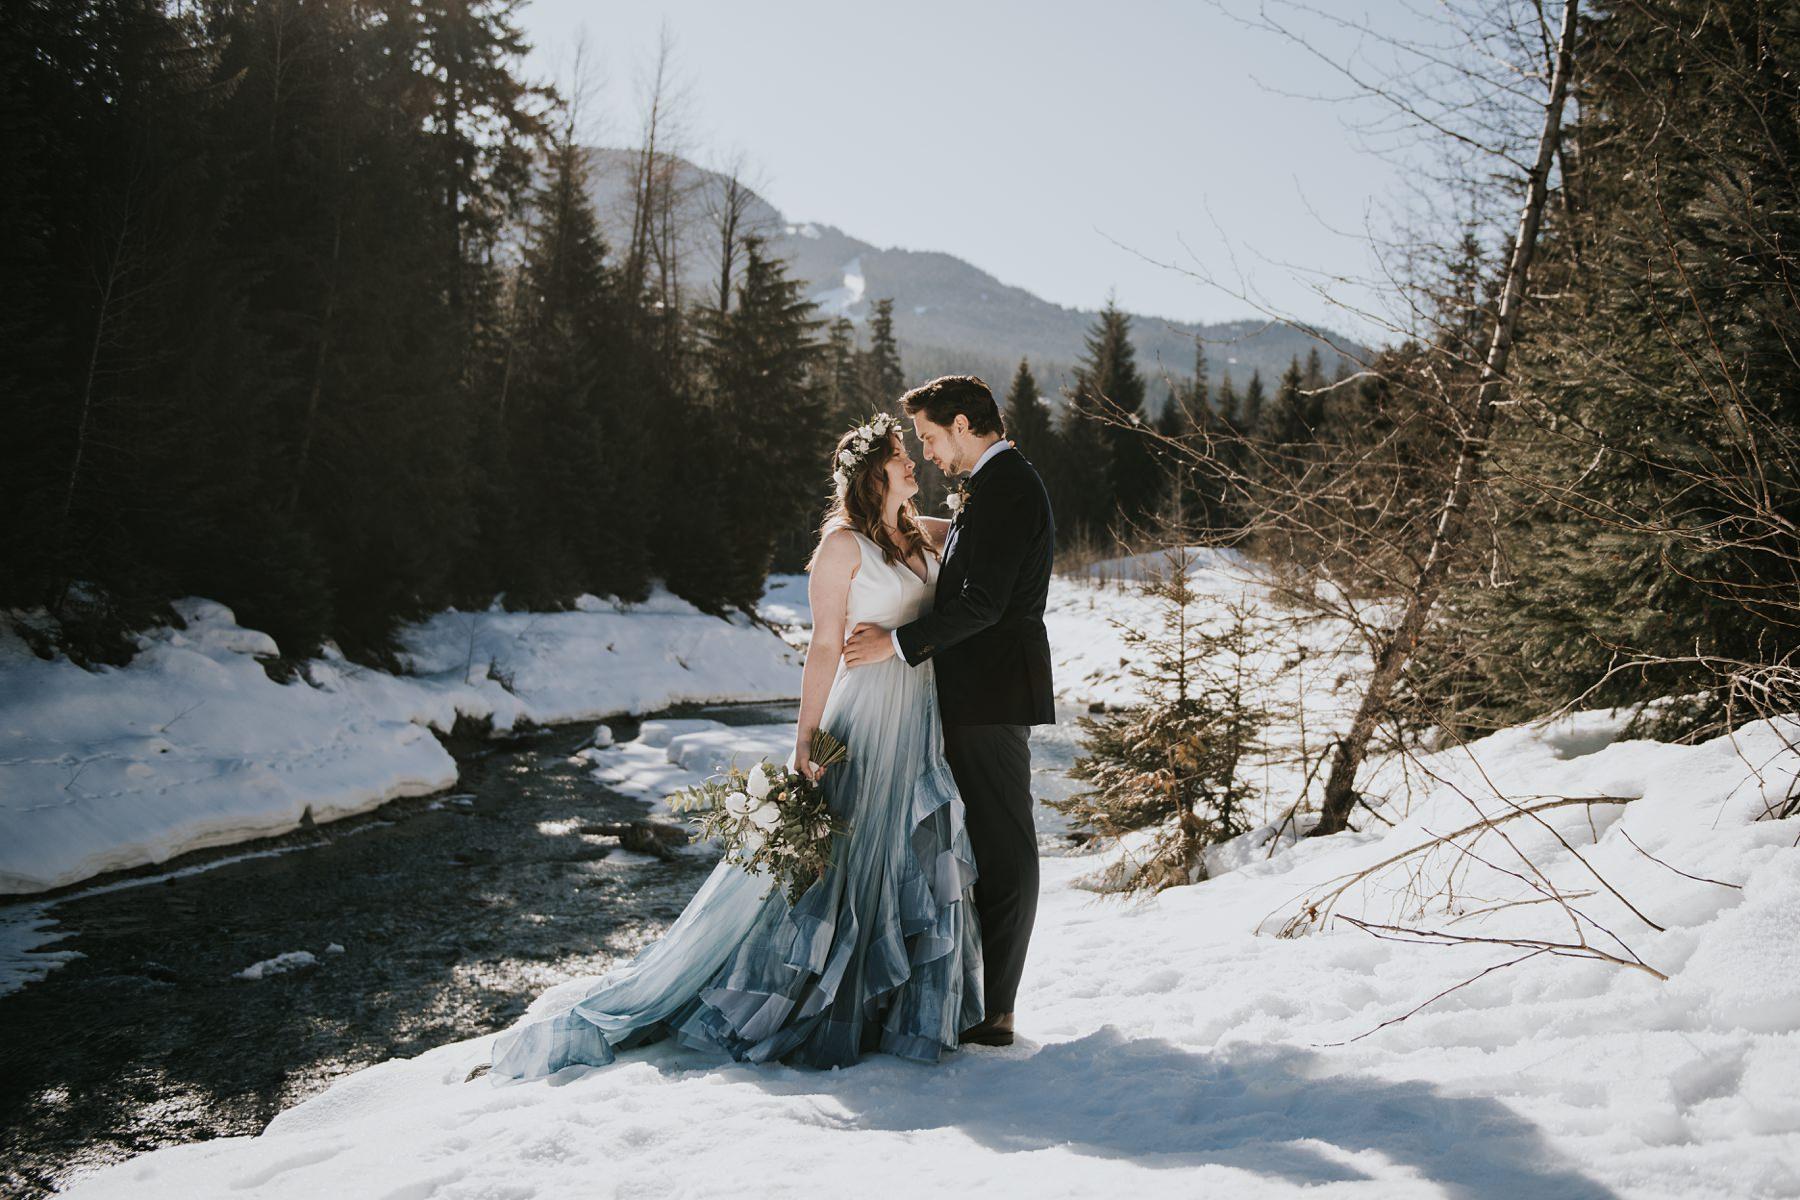 bride and groom embracing in the snow at the river at Nita lake lodge wedding